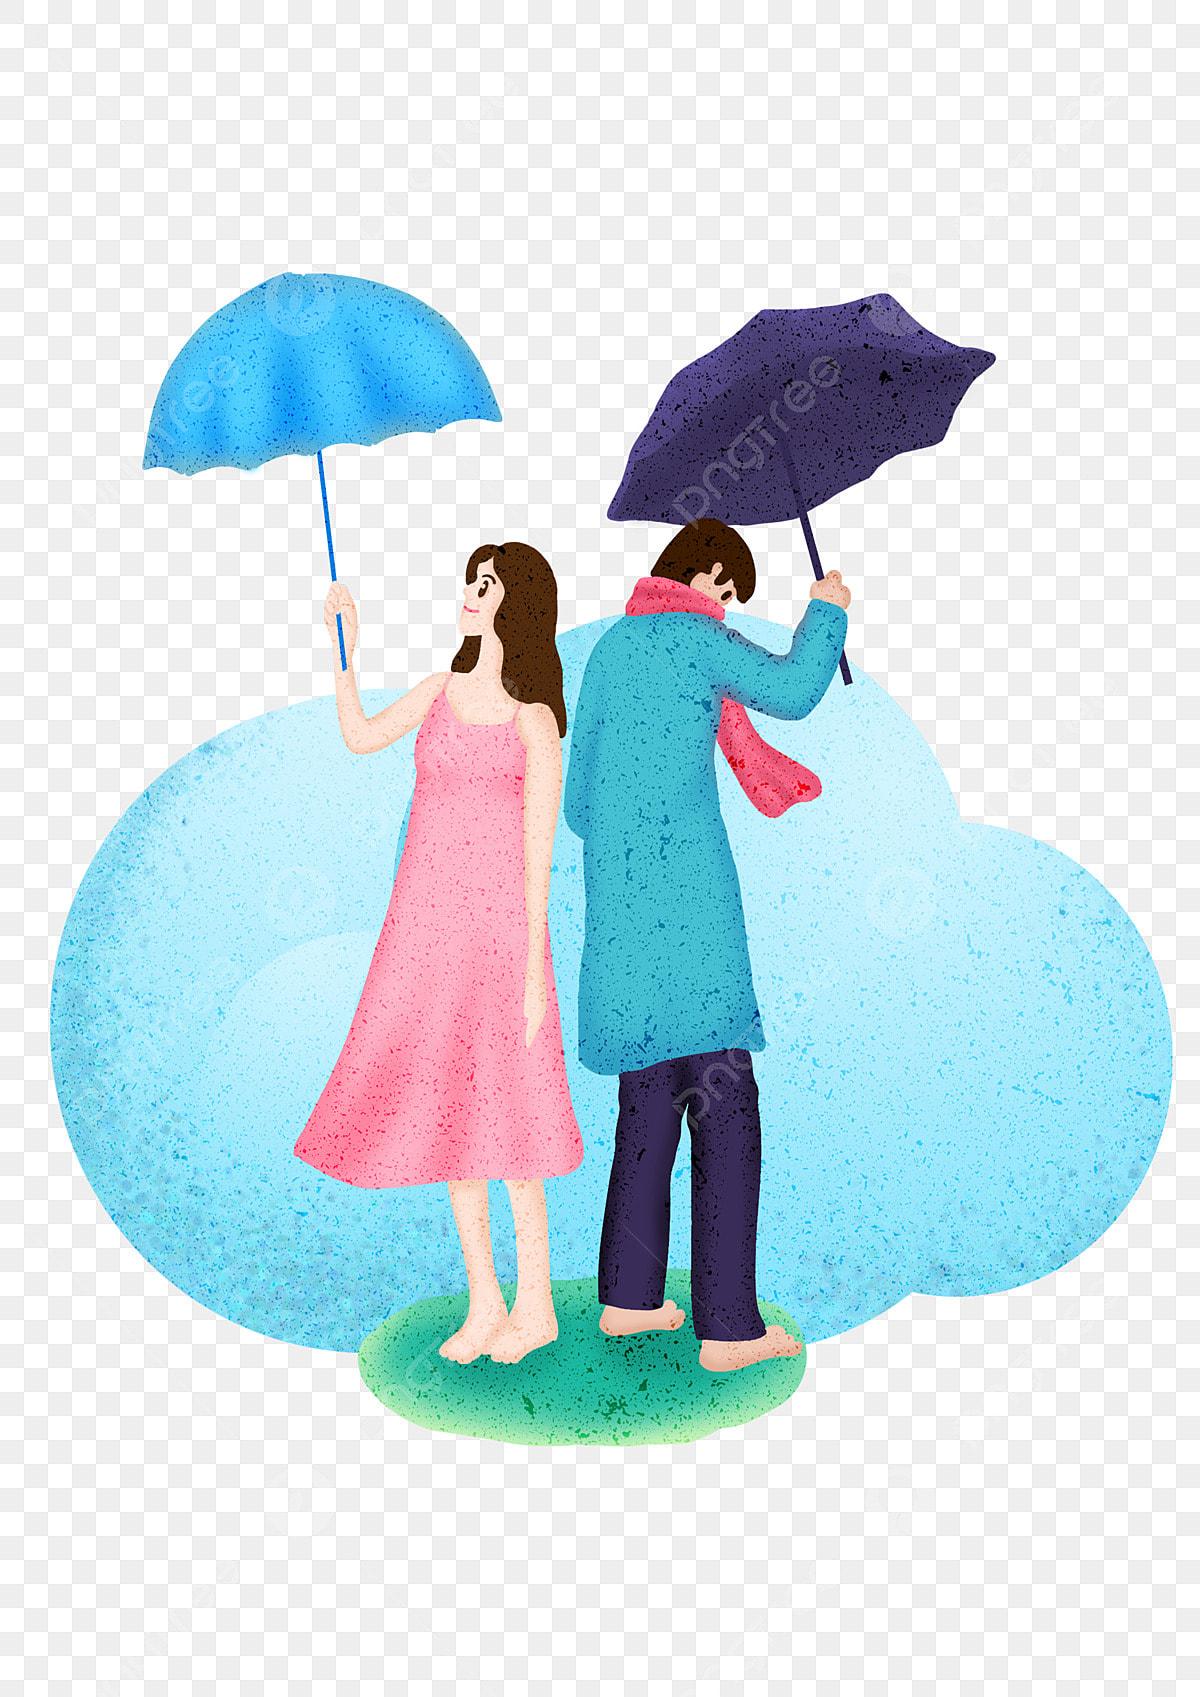 Love Across Time And Space Couple Rainy Couple Cartoon Hand Drawn